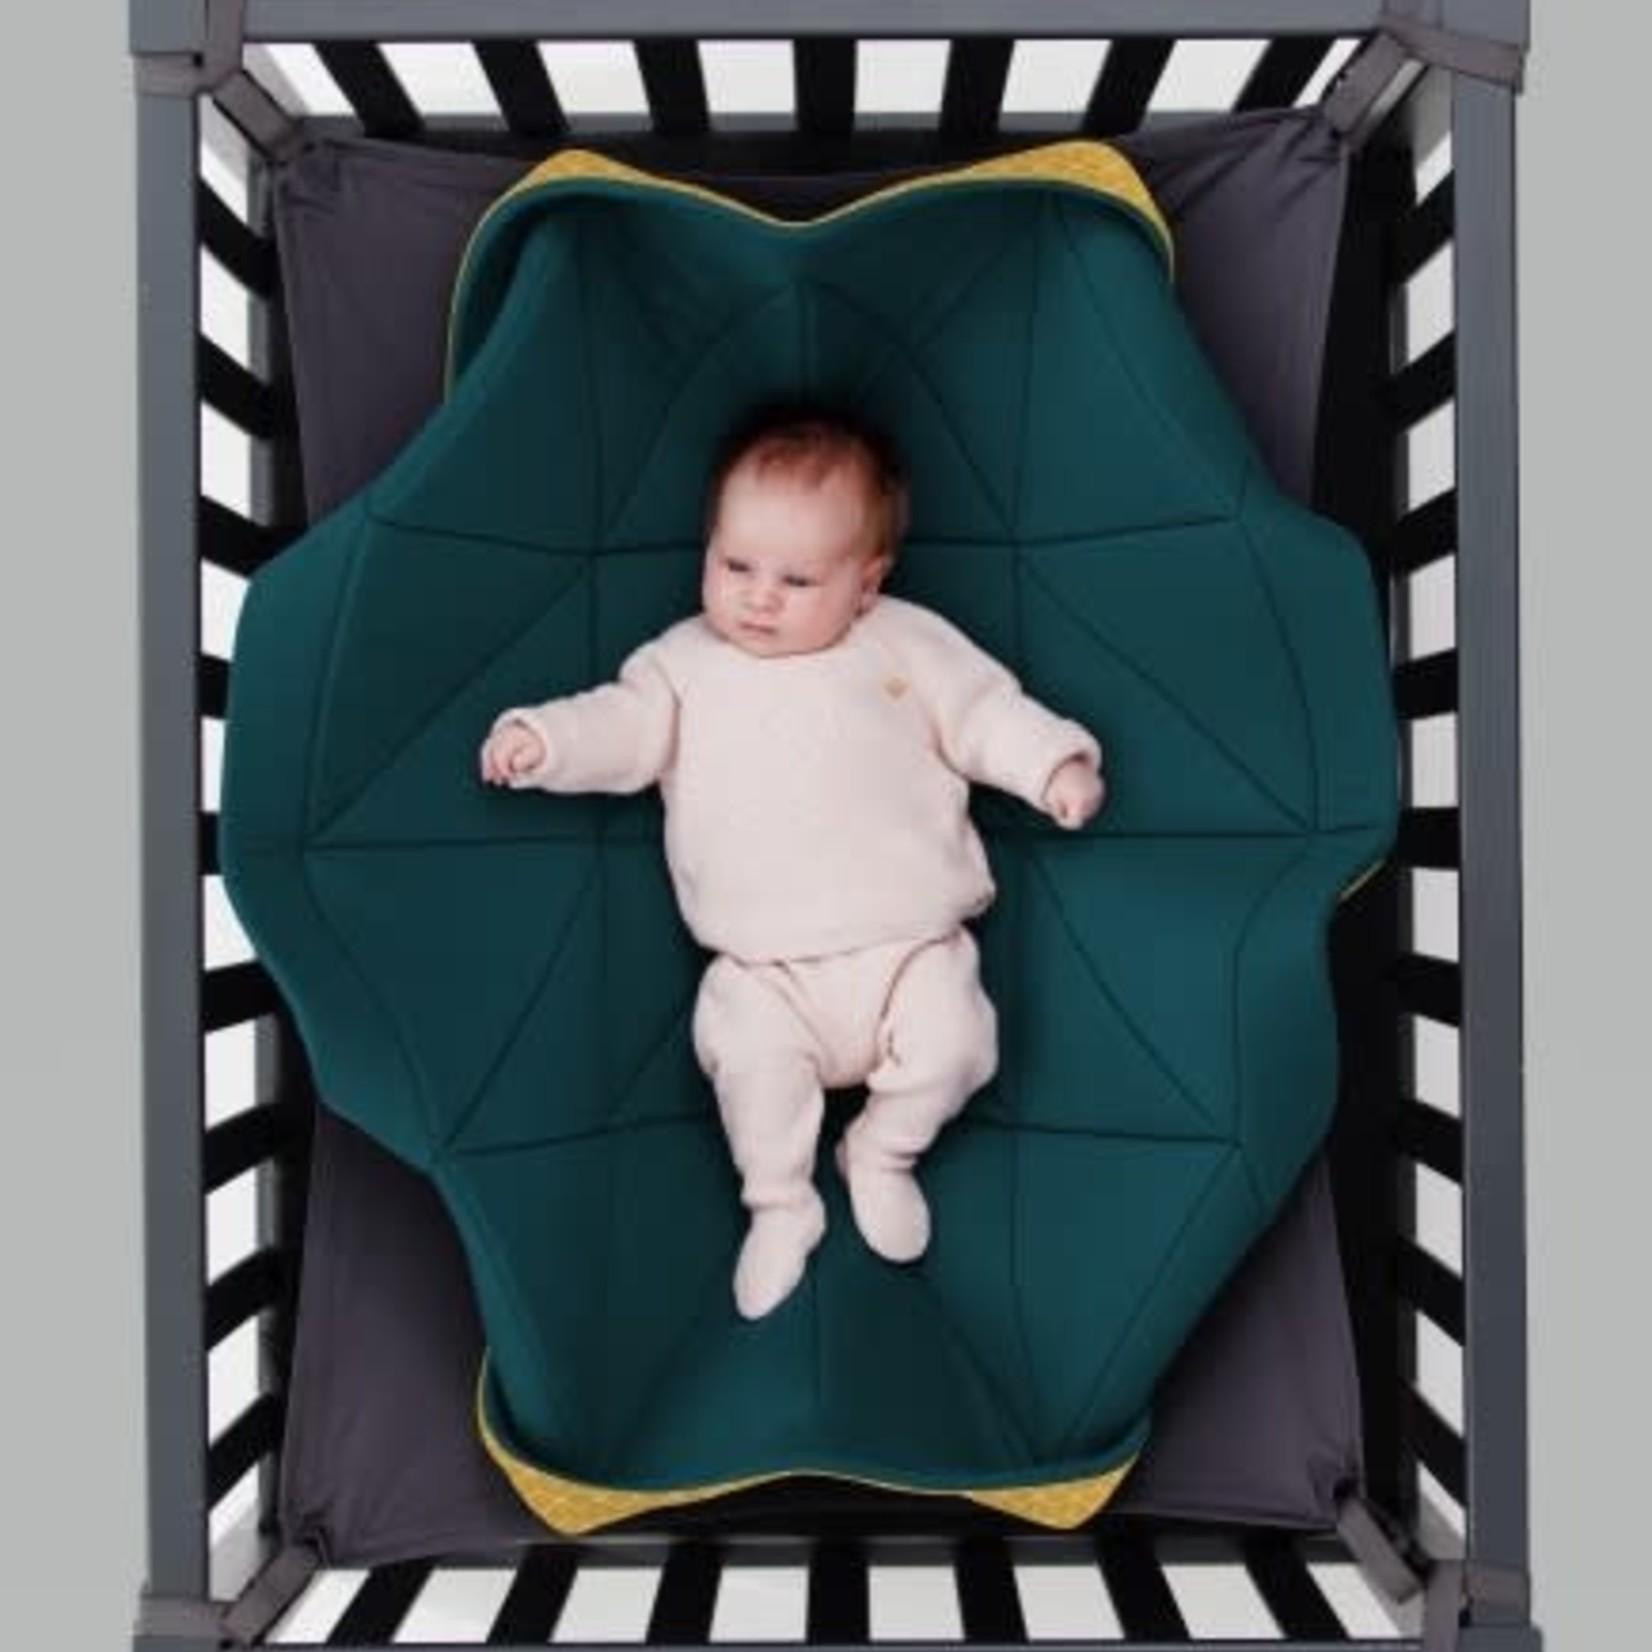 HANGLOOSE Hangloose baby